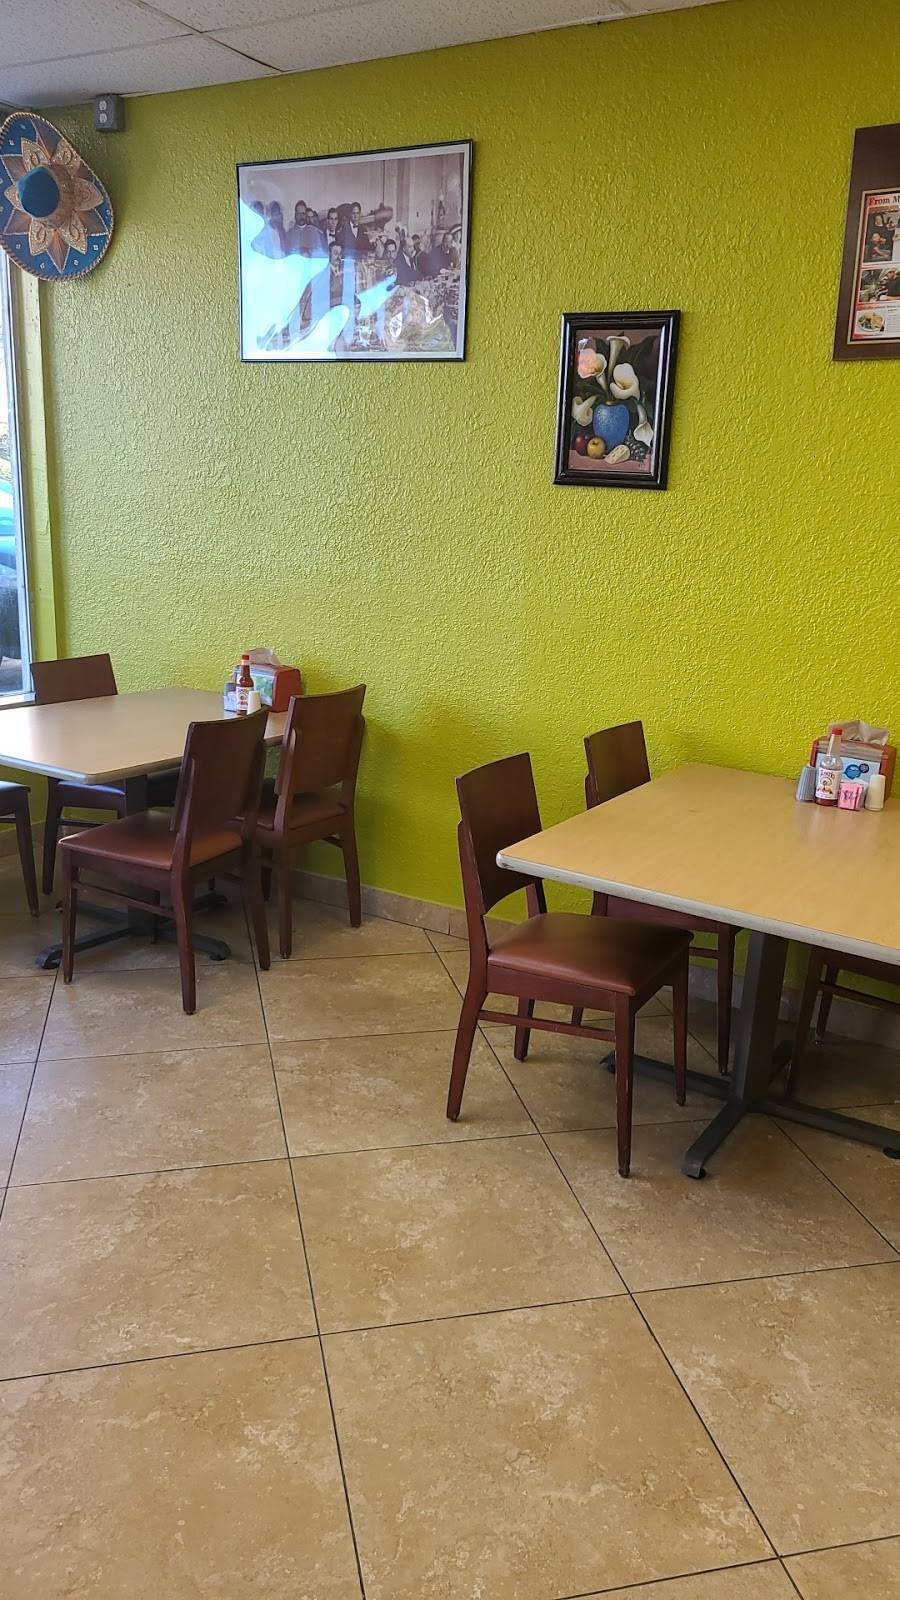 Tres Leches Cafe | restaurant | 2514 S Atlantic Ave, Daytona Beach, FL 32118, USA | 3862389166 OR +1 386-238-9166